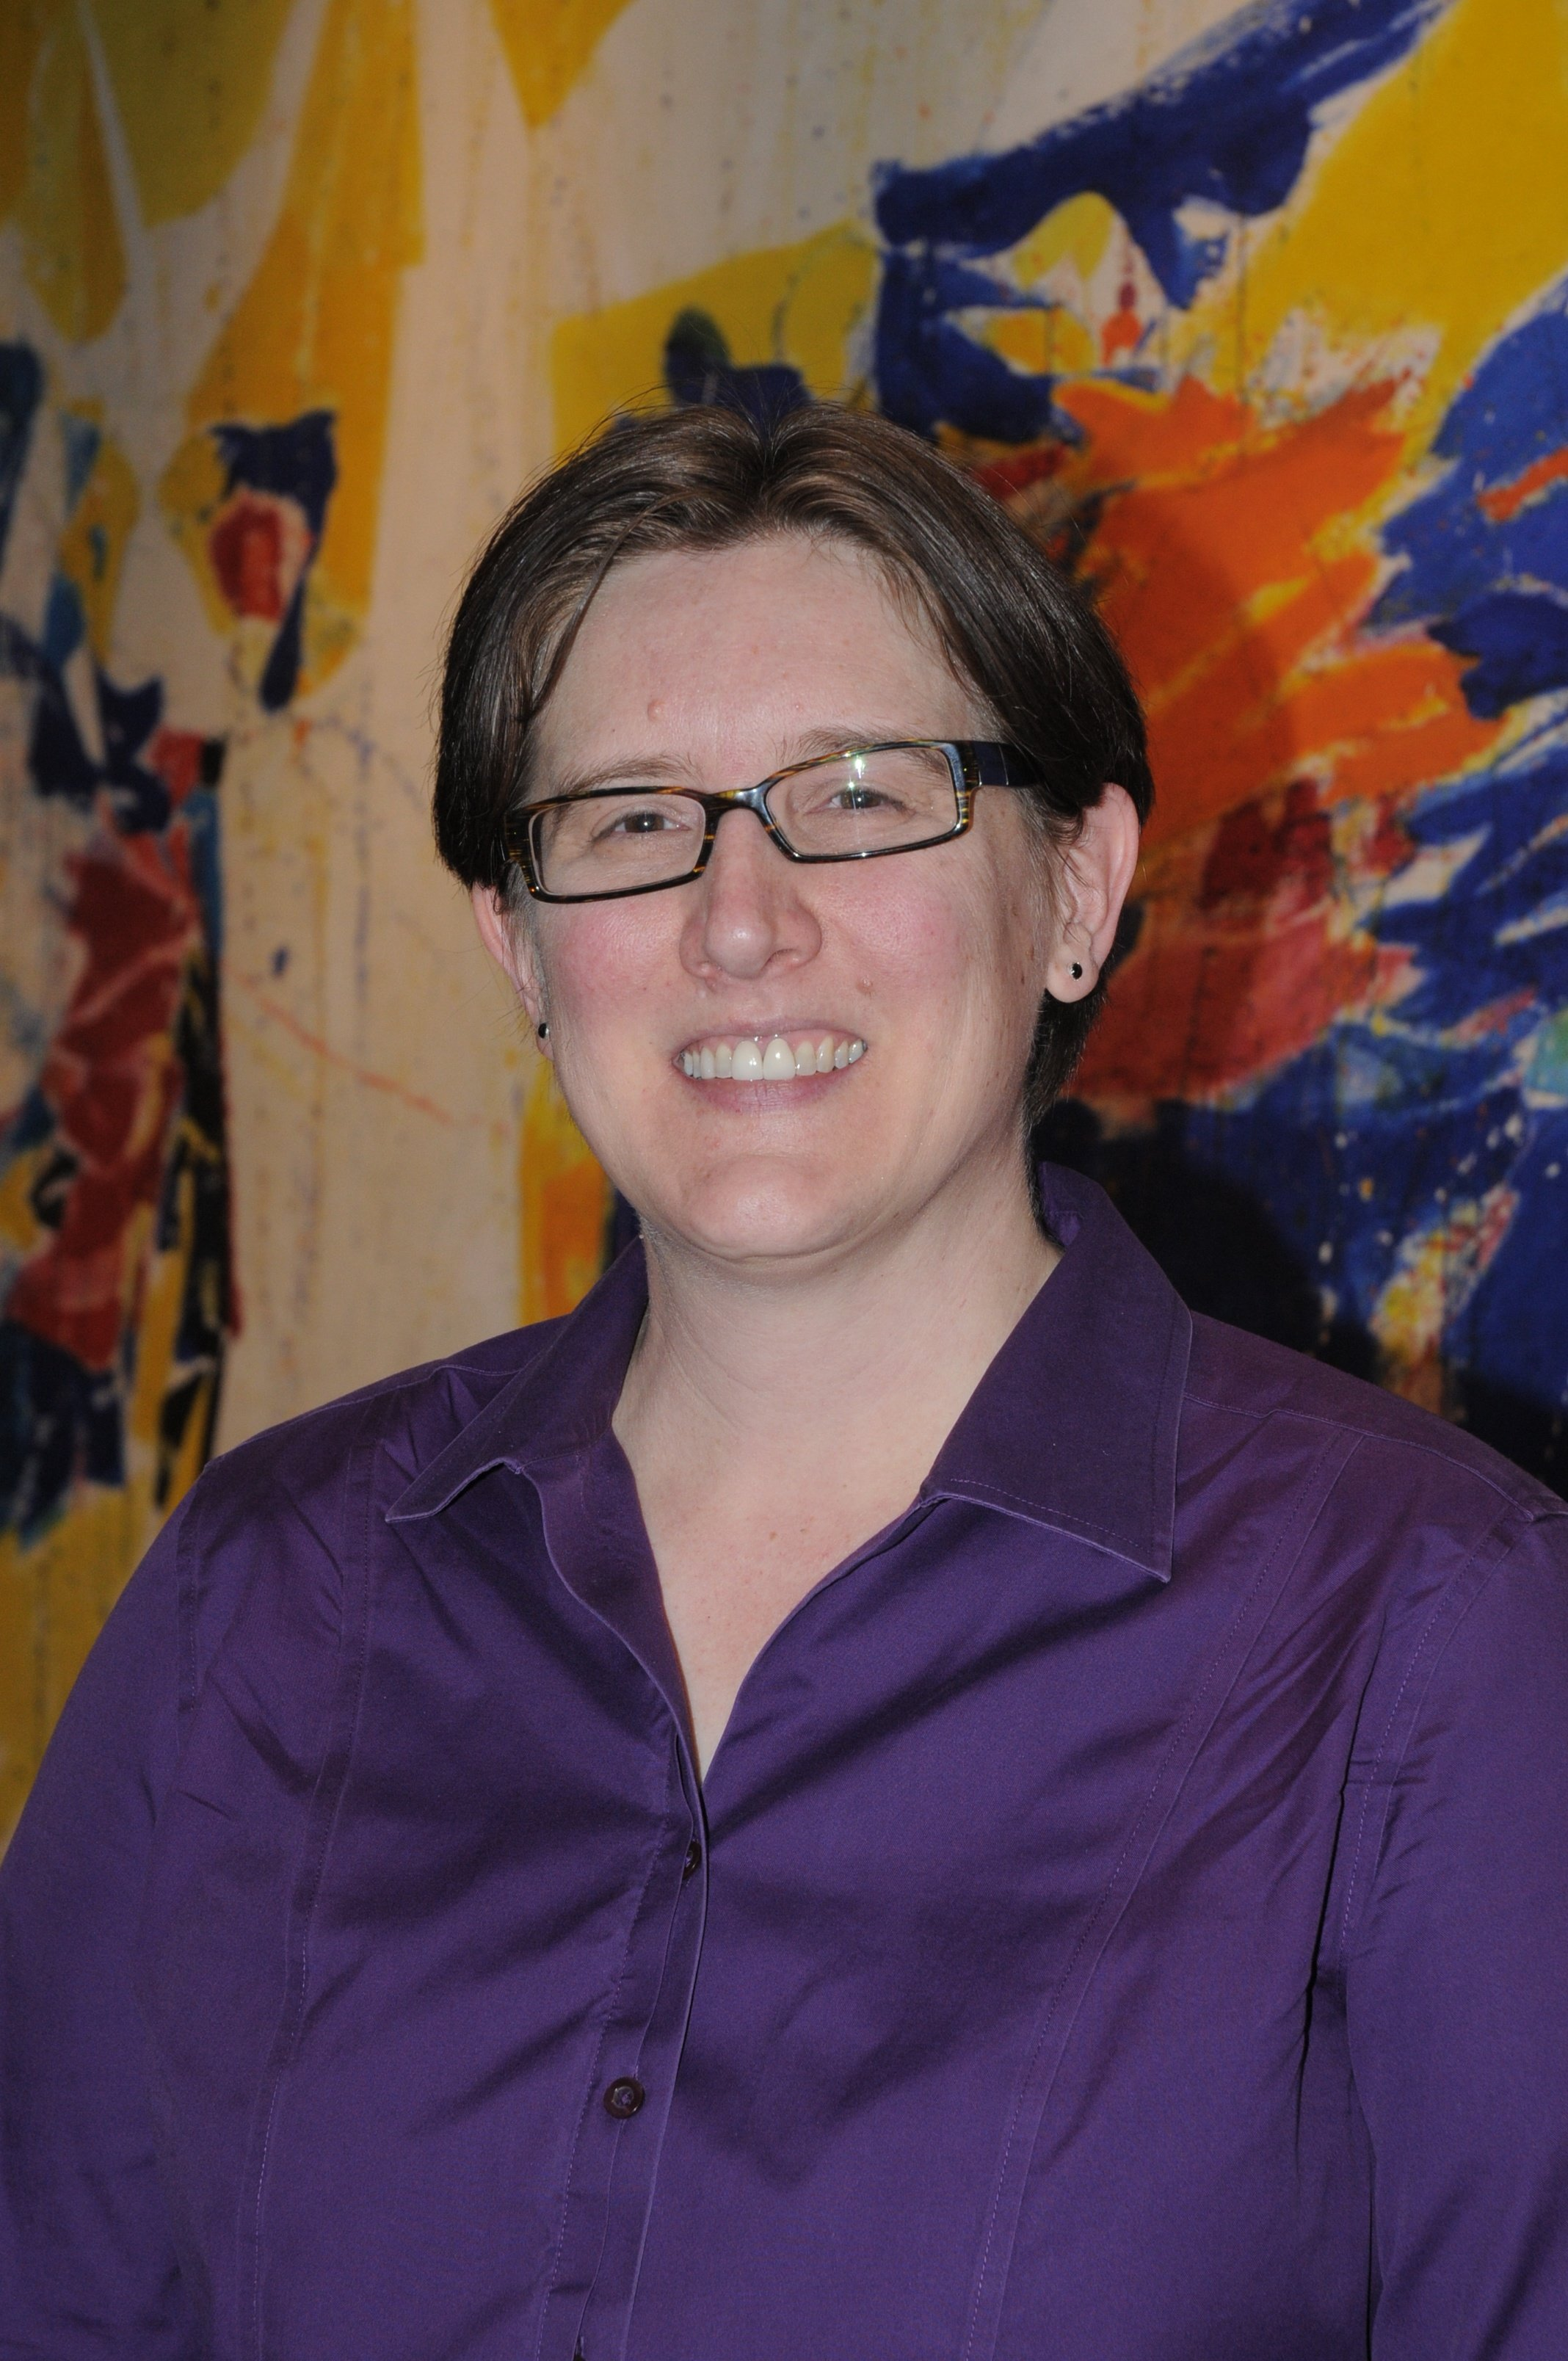 ONUG speaker, Jennifer Rexford